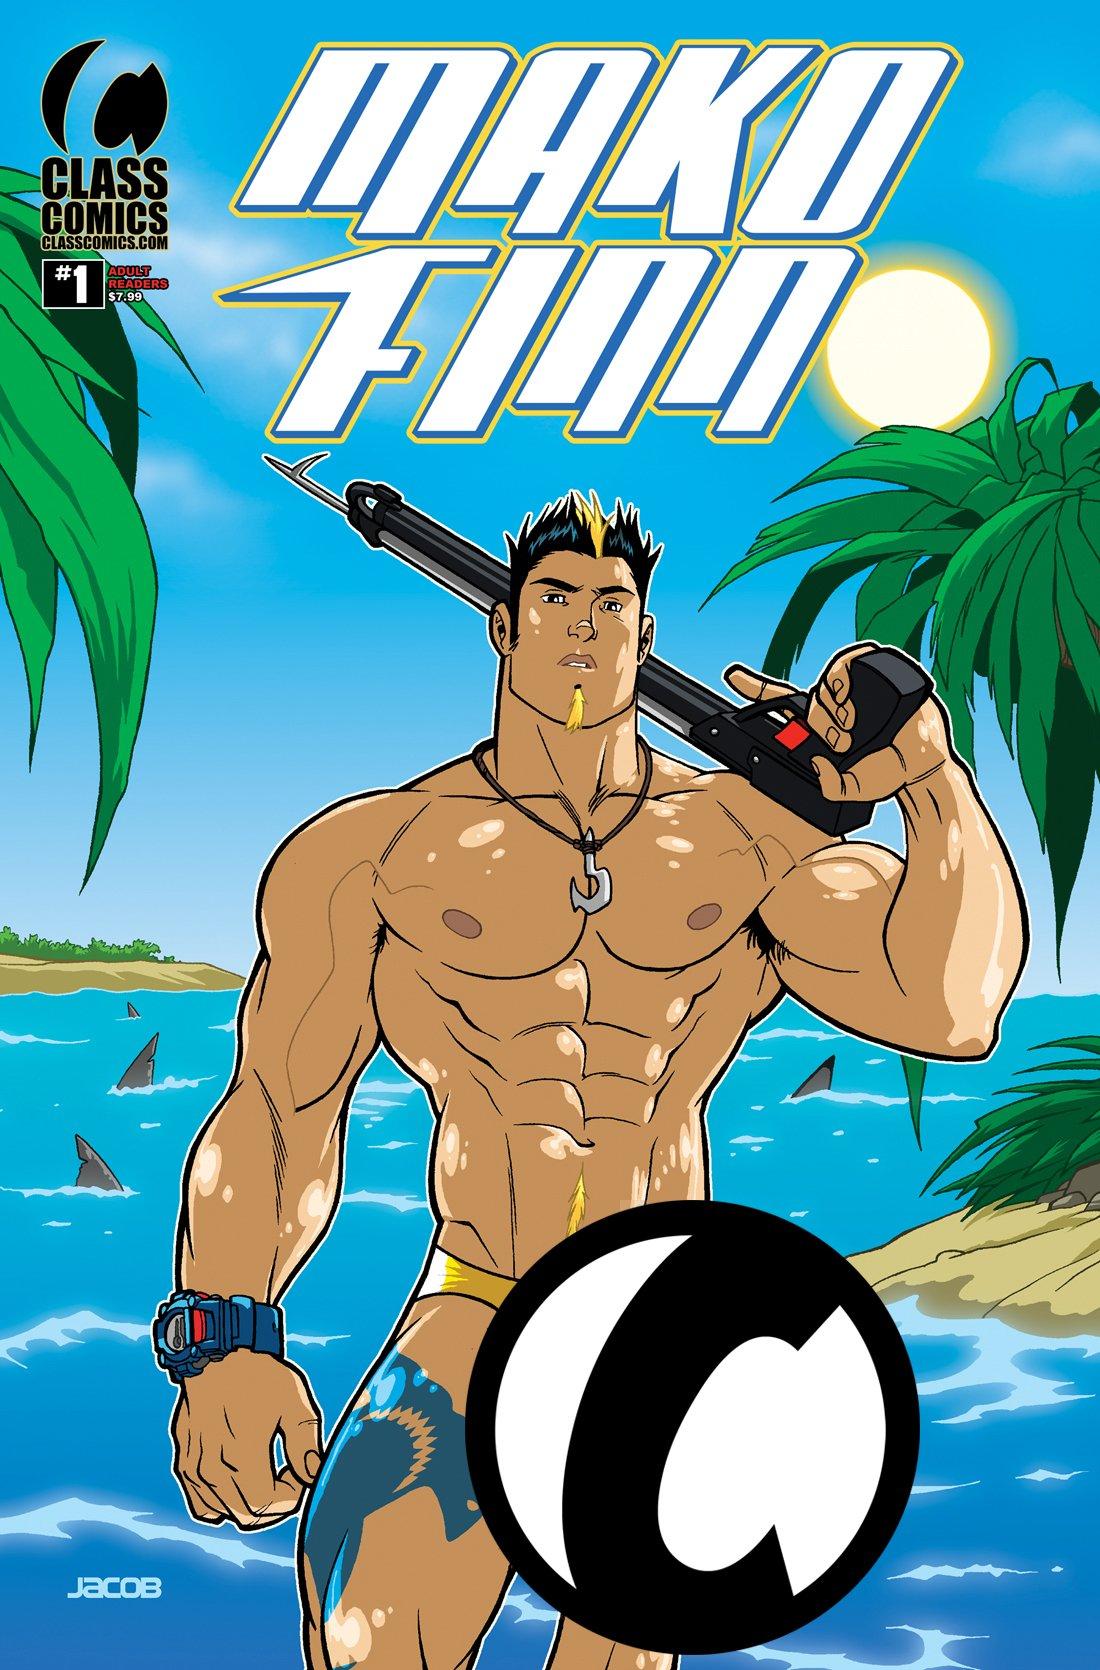 zahn class comics 8